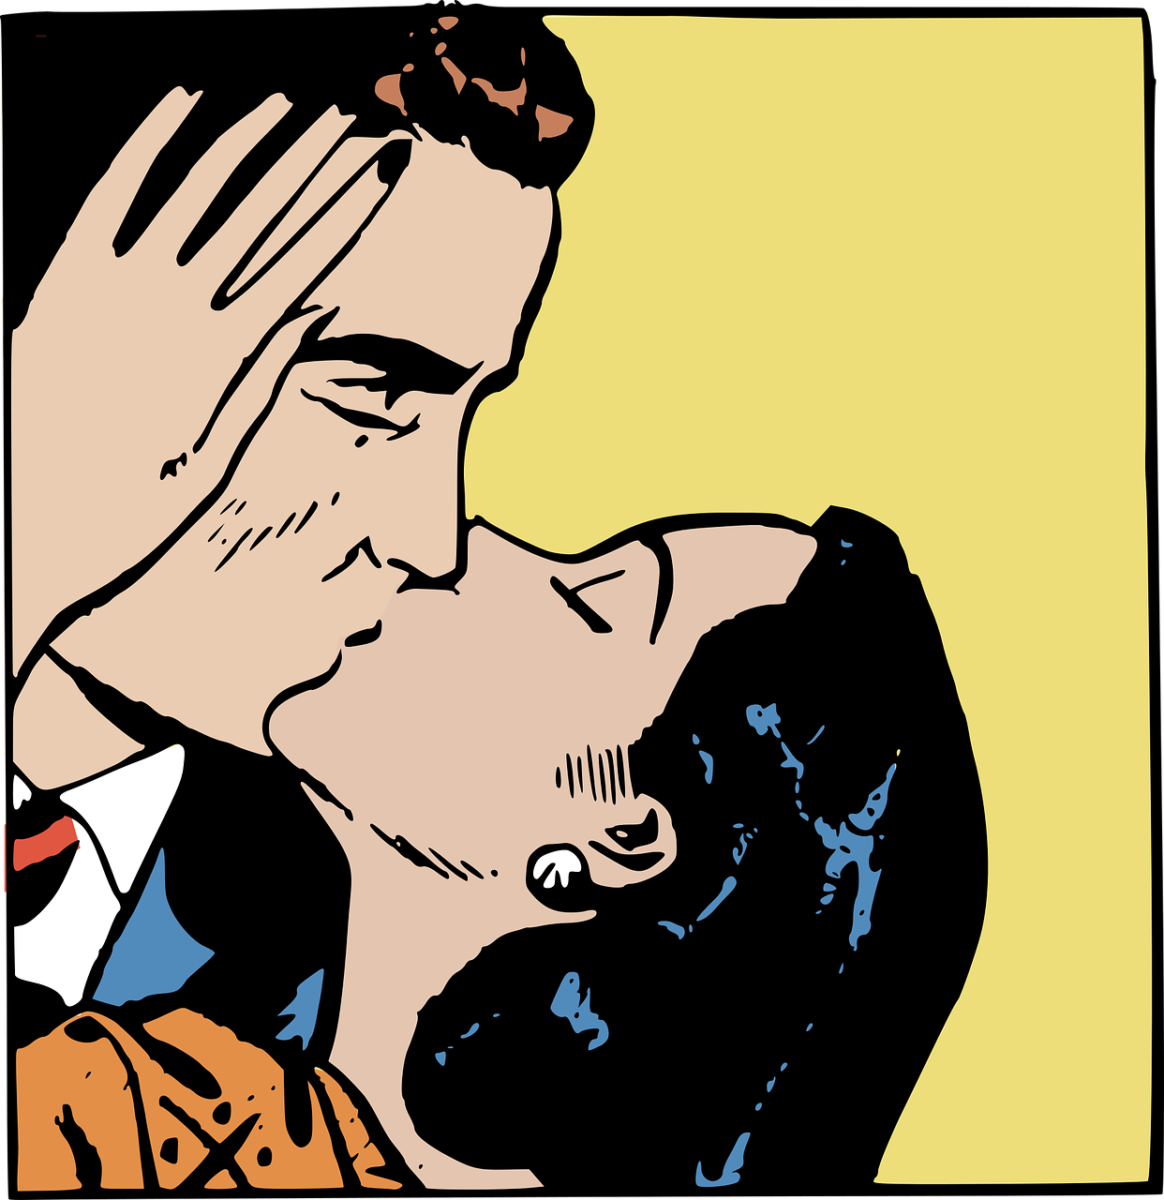 Fumetto al bacio